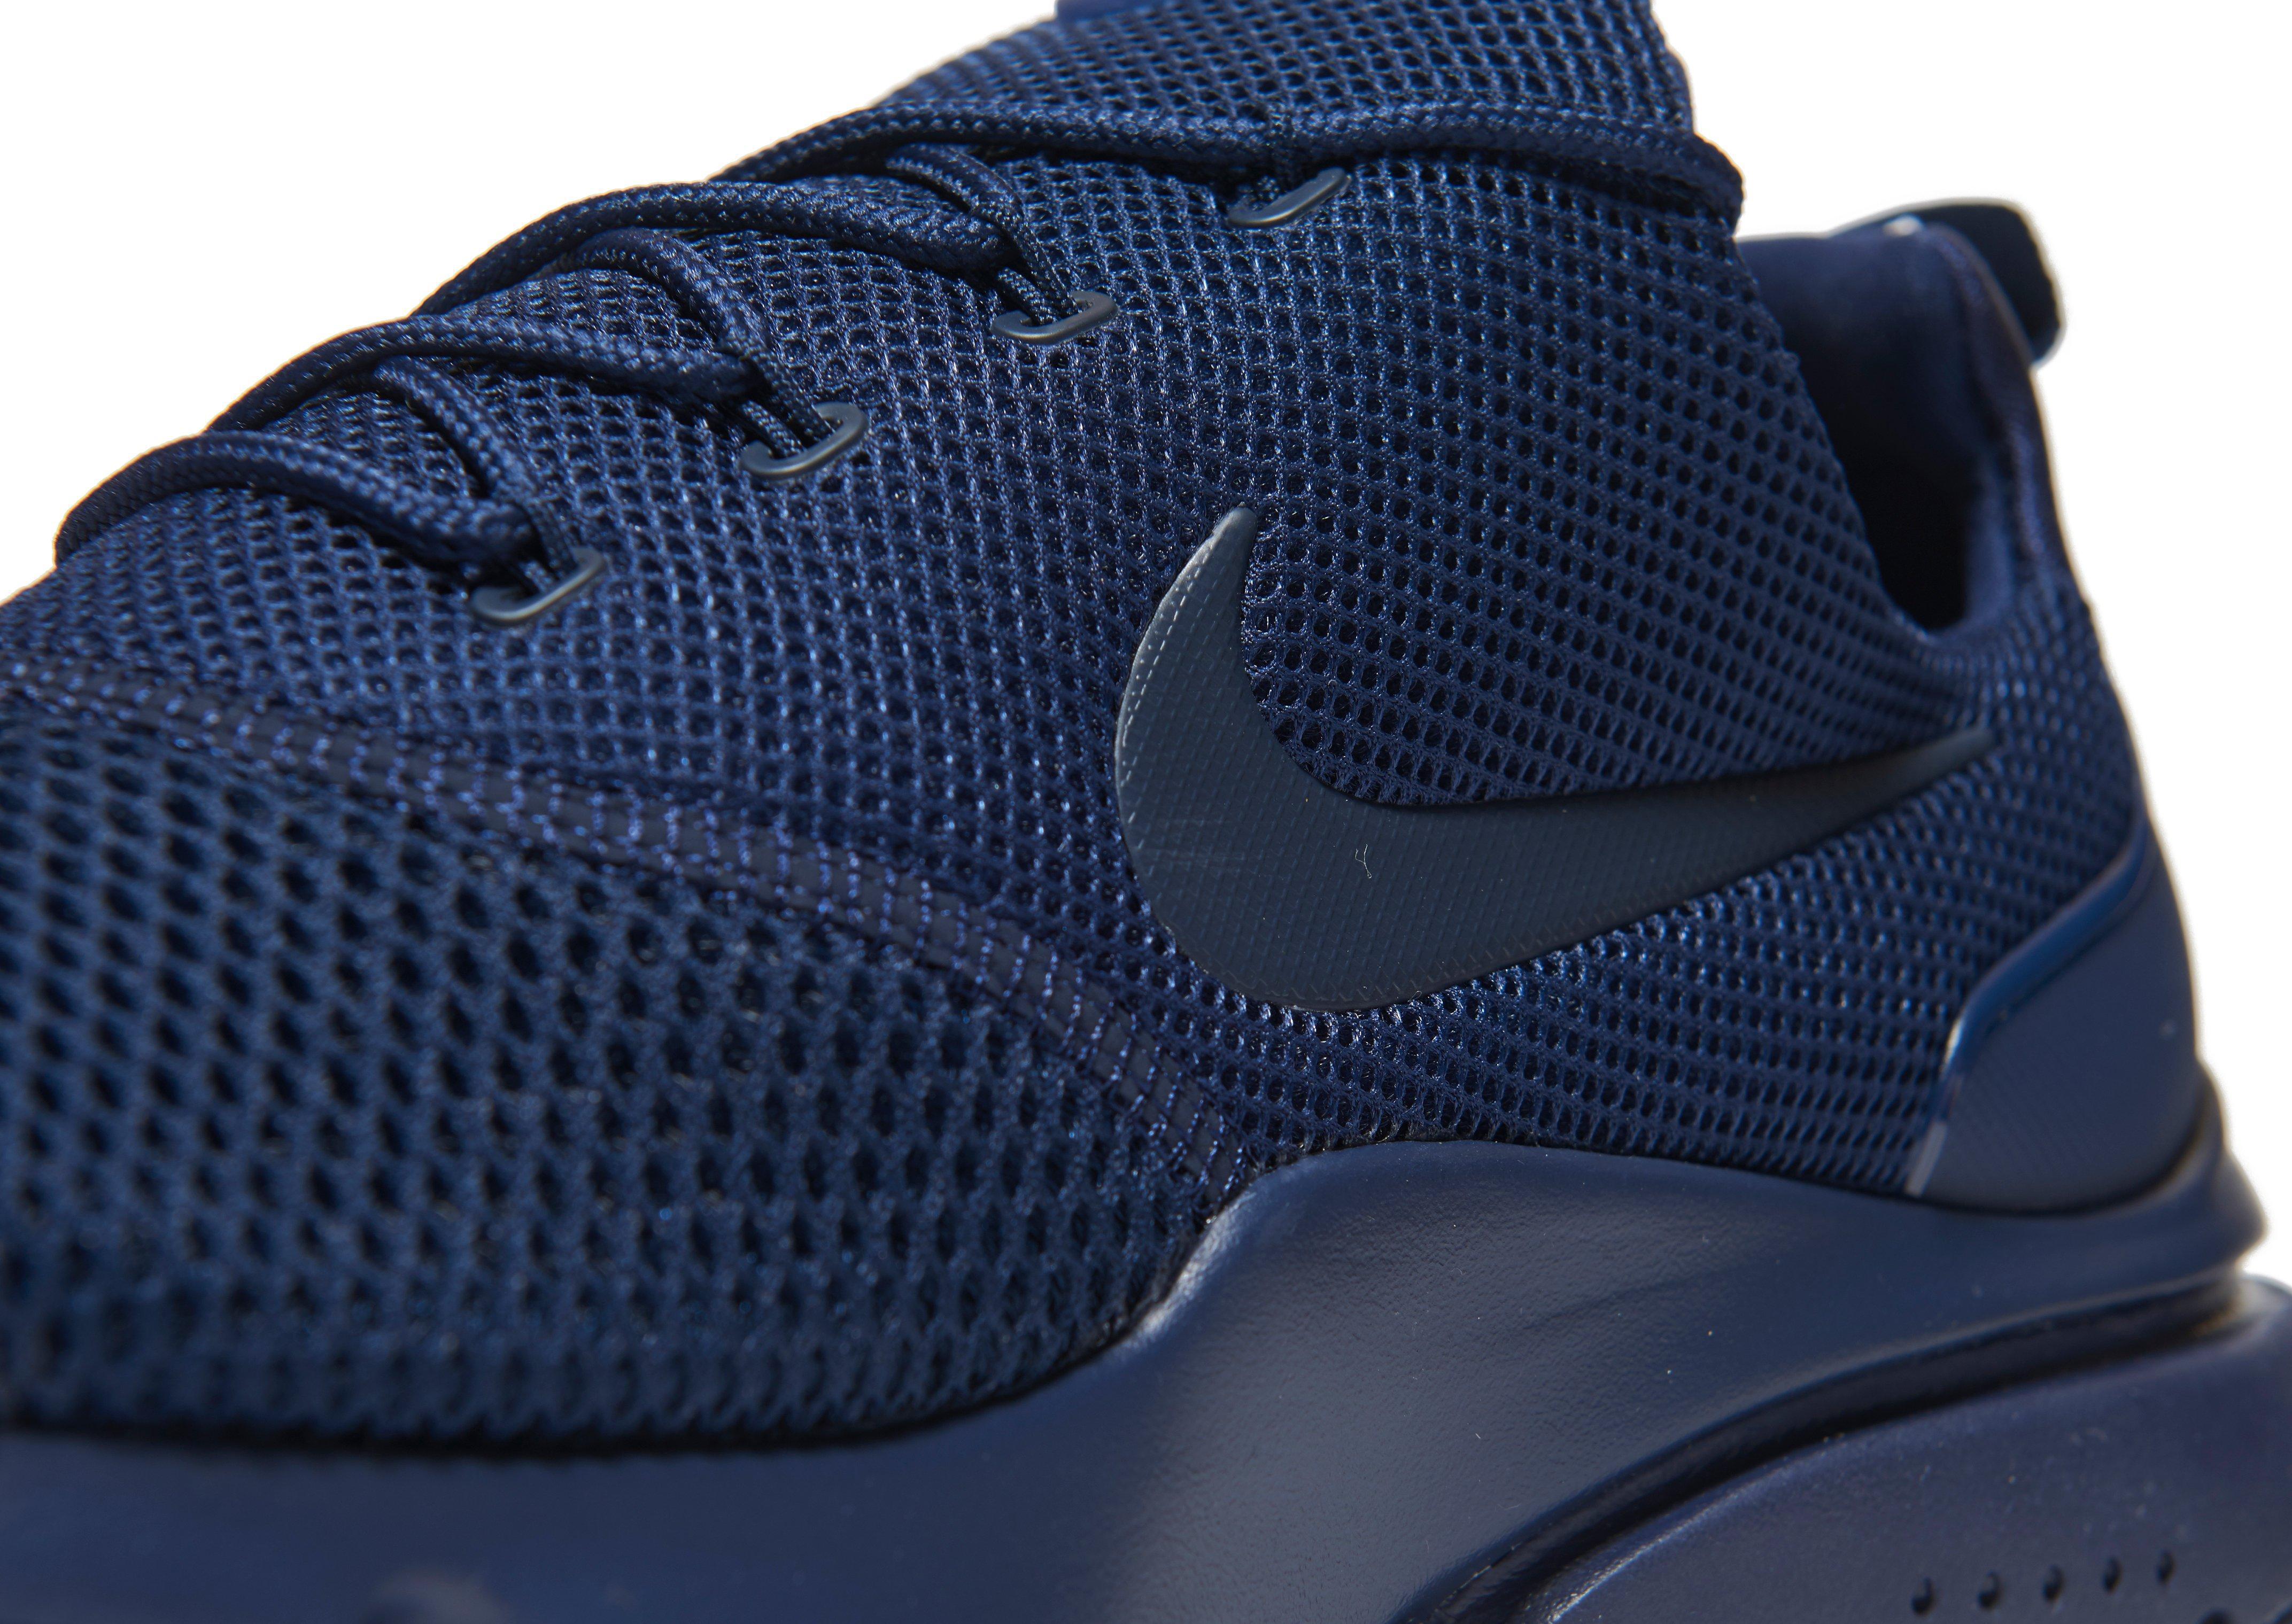 Nike Rubber Air Presto Fly in Navy